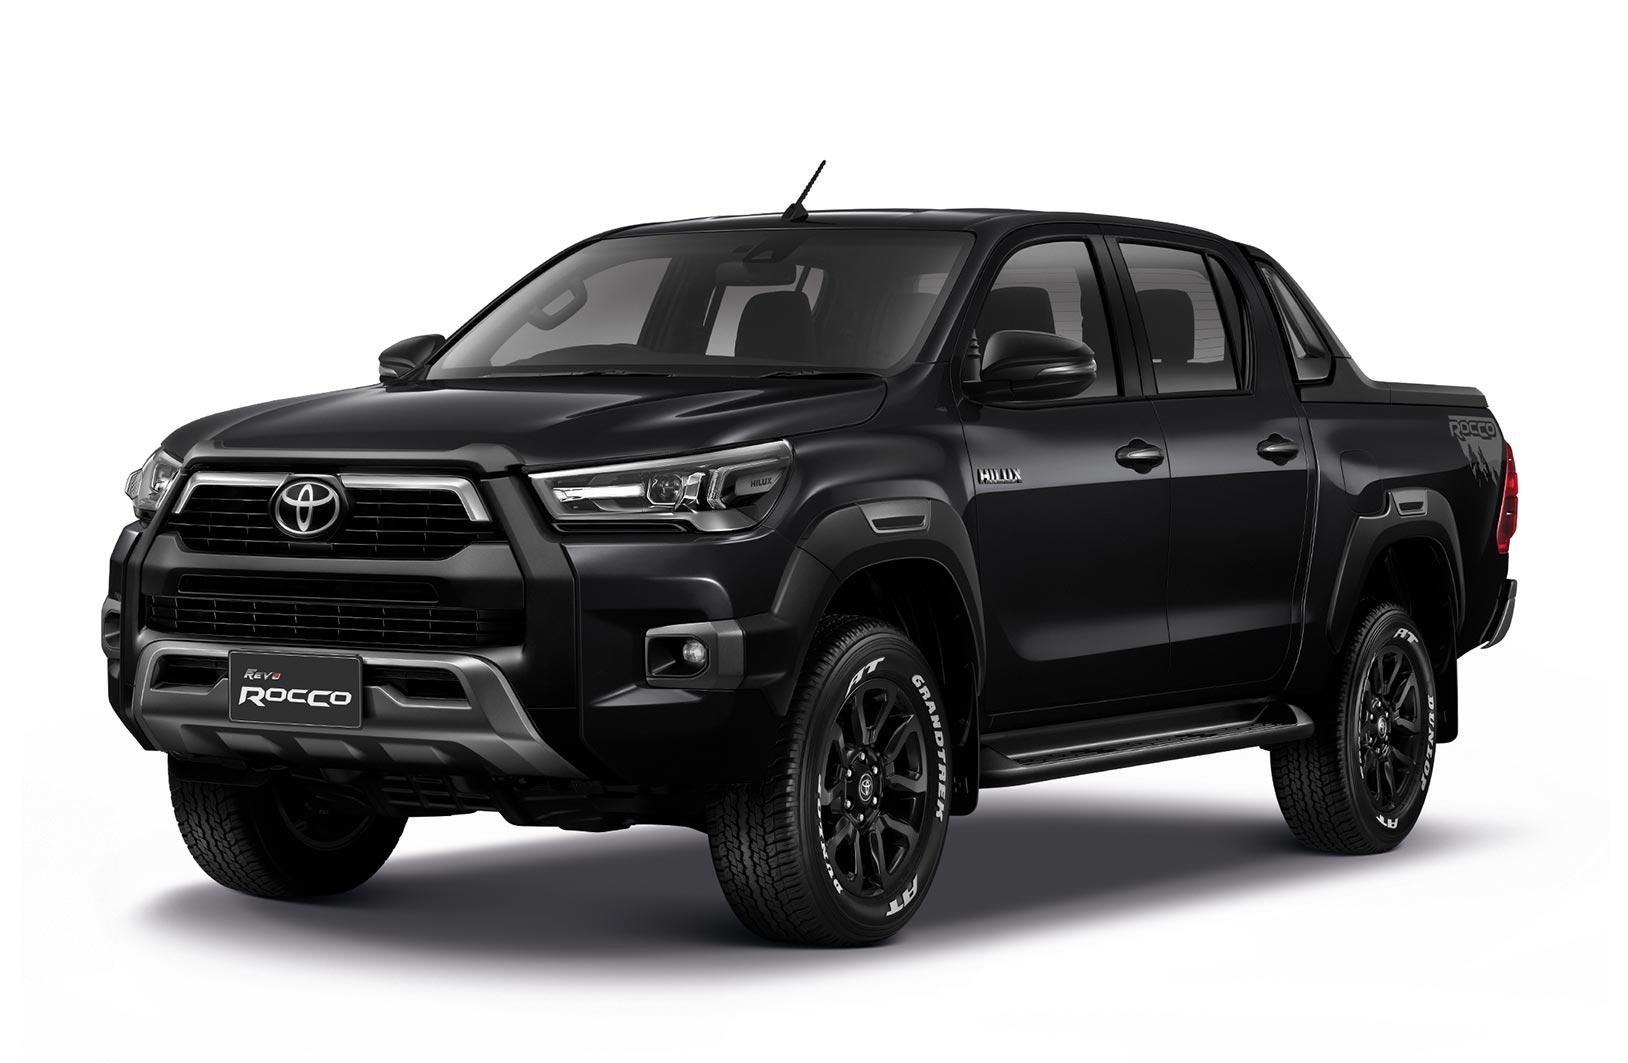 Toyota Hilux Rocco (2021)